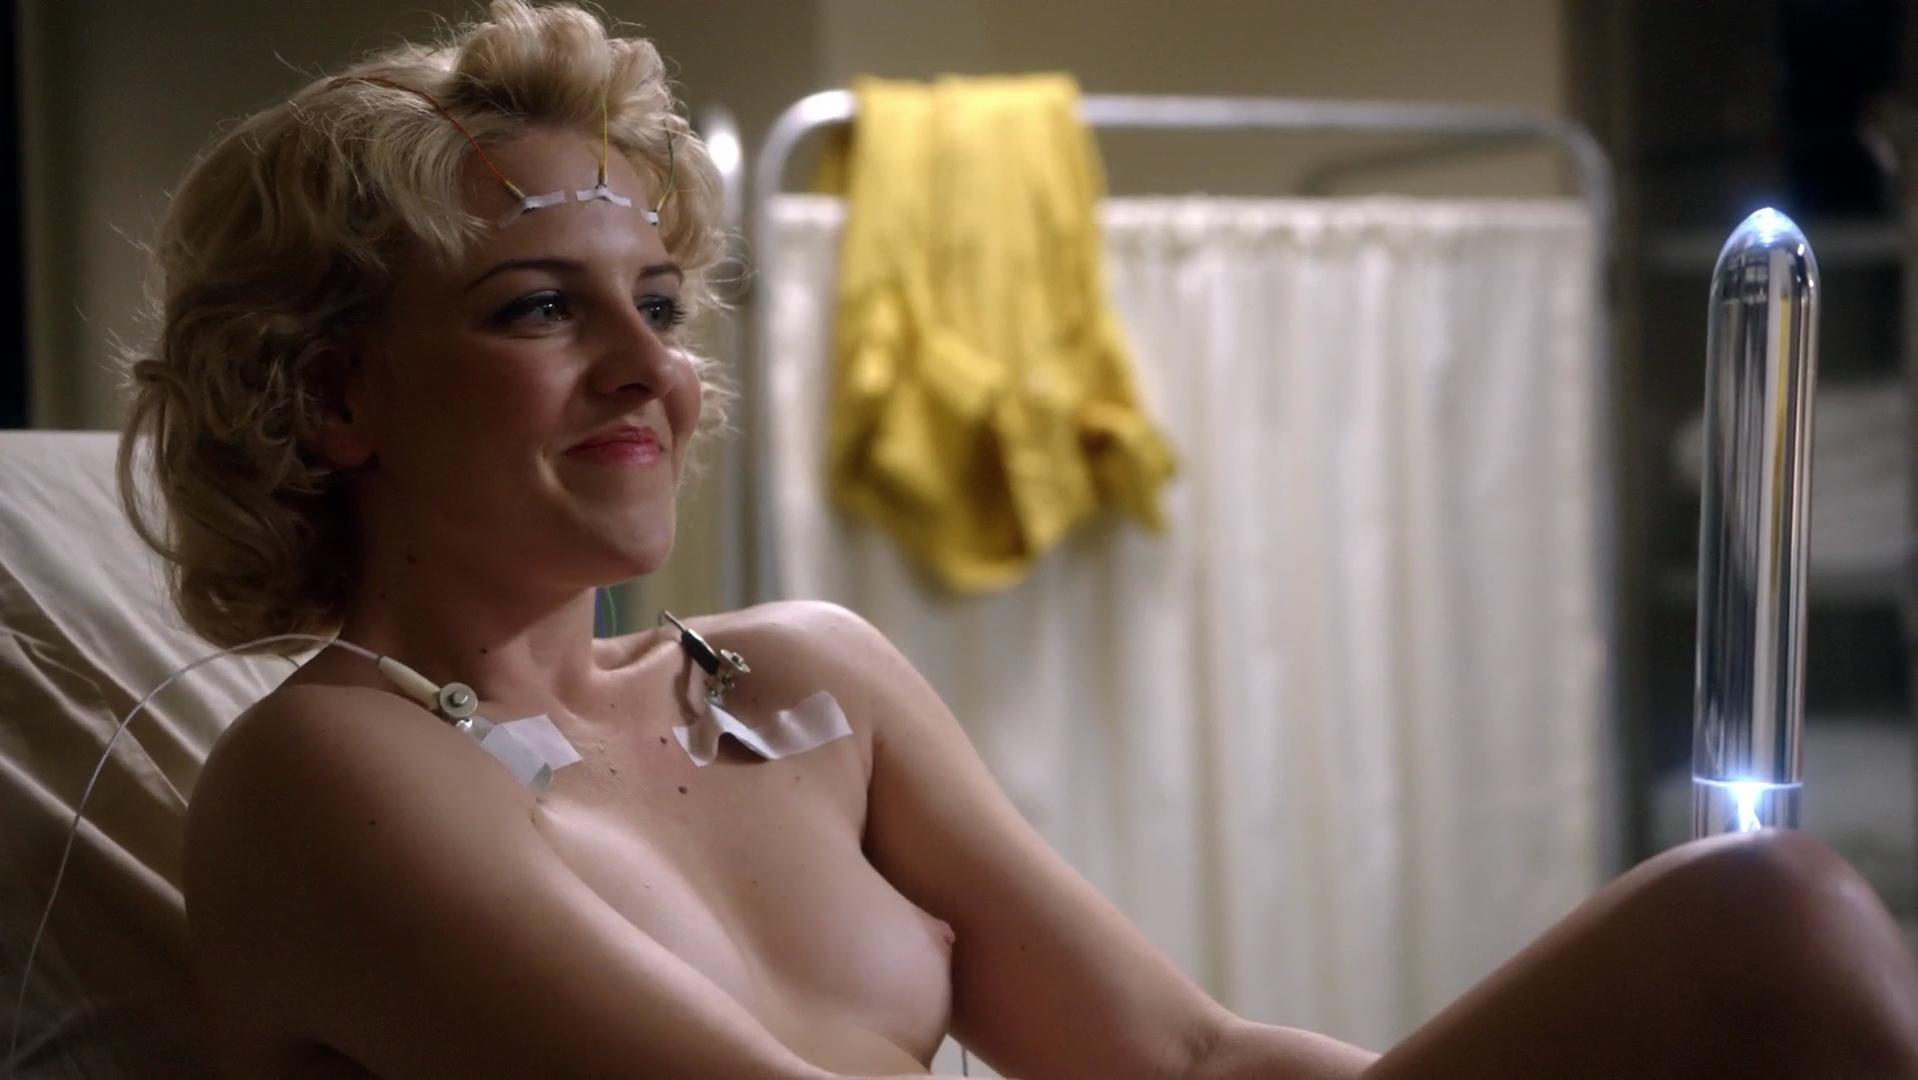 Amalie Helene Nude nude video celebs » lizzy caplan nude, helene yorke nude